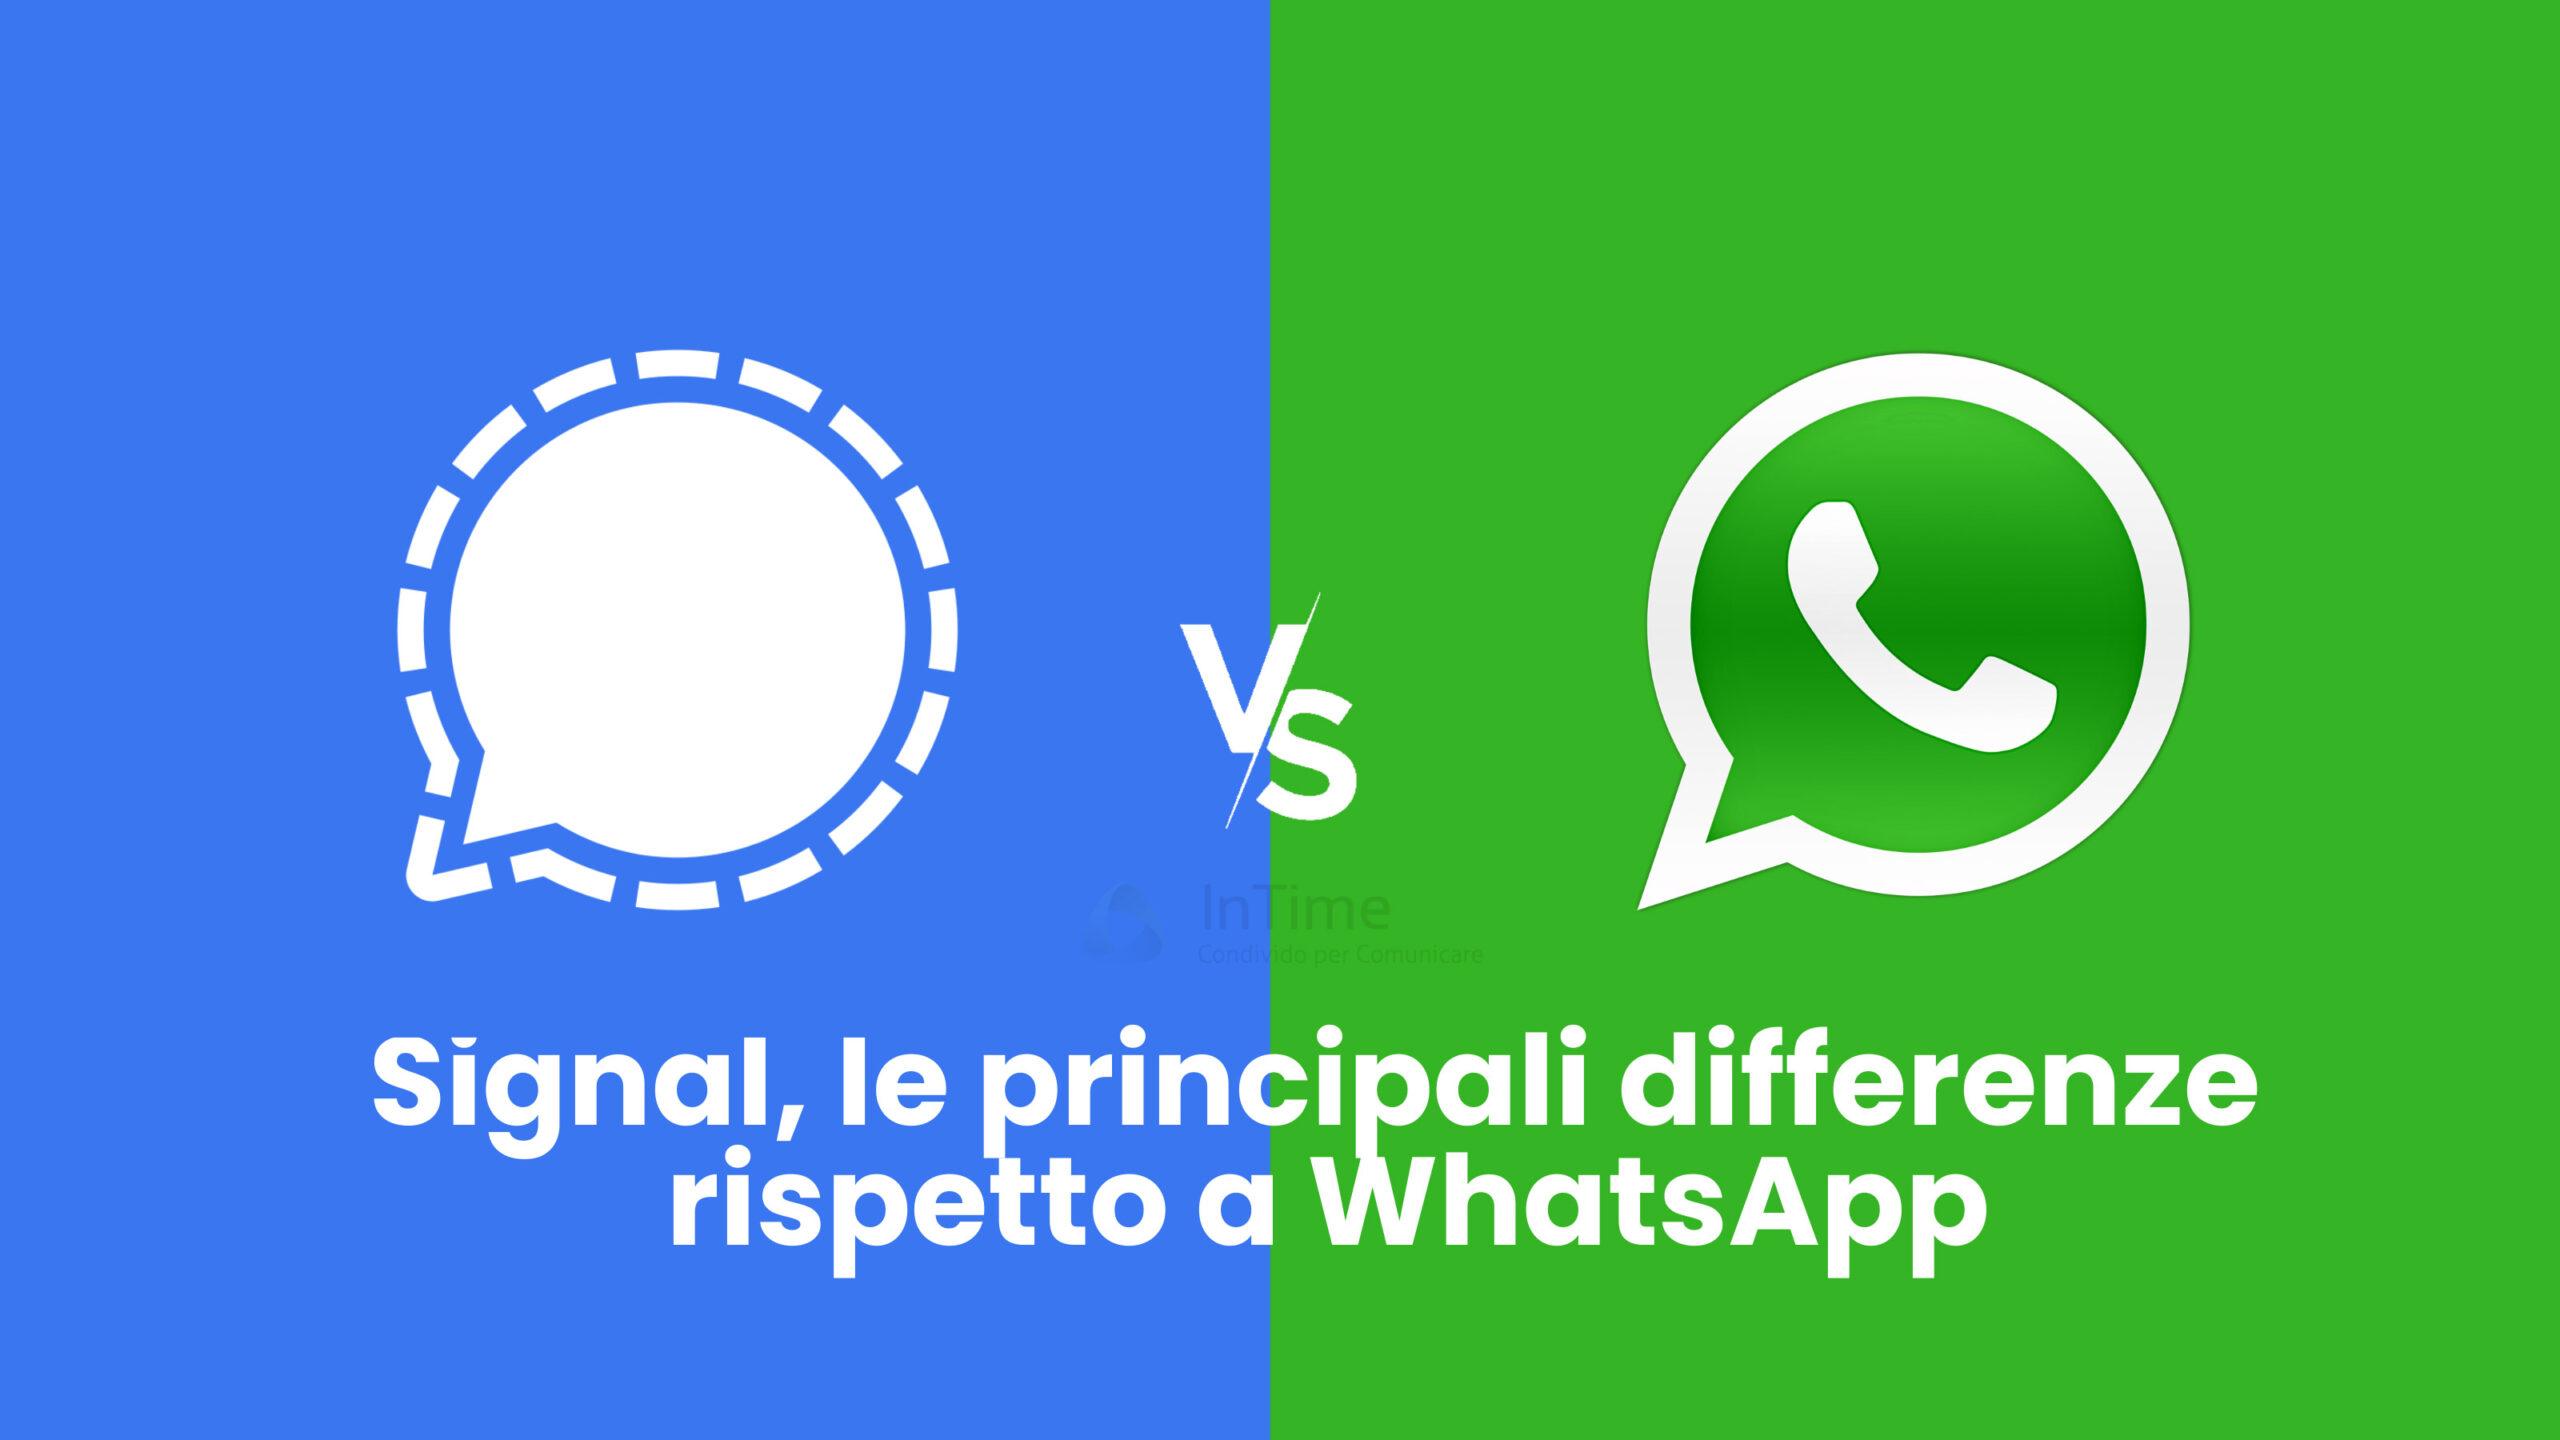 signal vs whatsapp franzrusso.it 2021